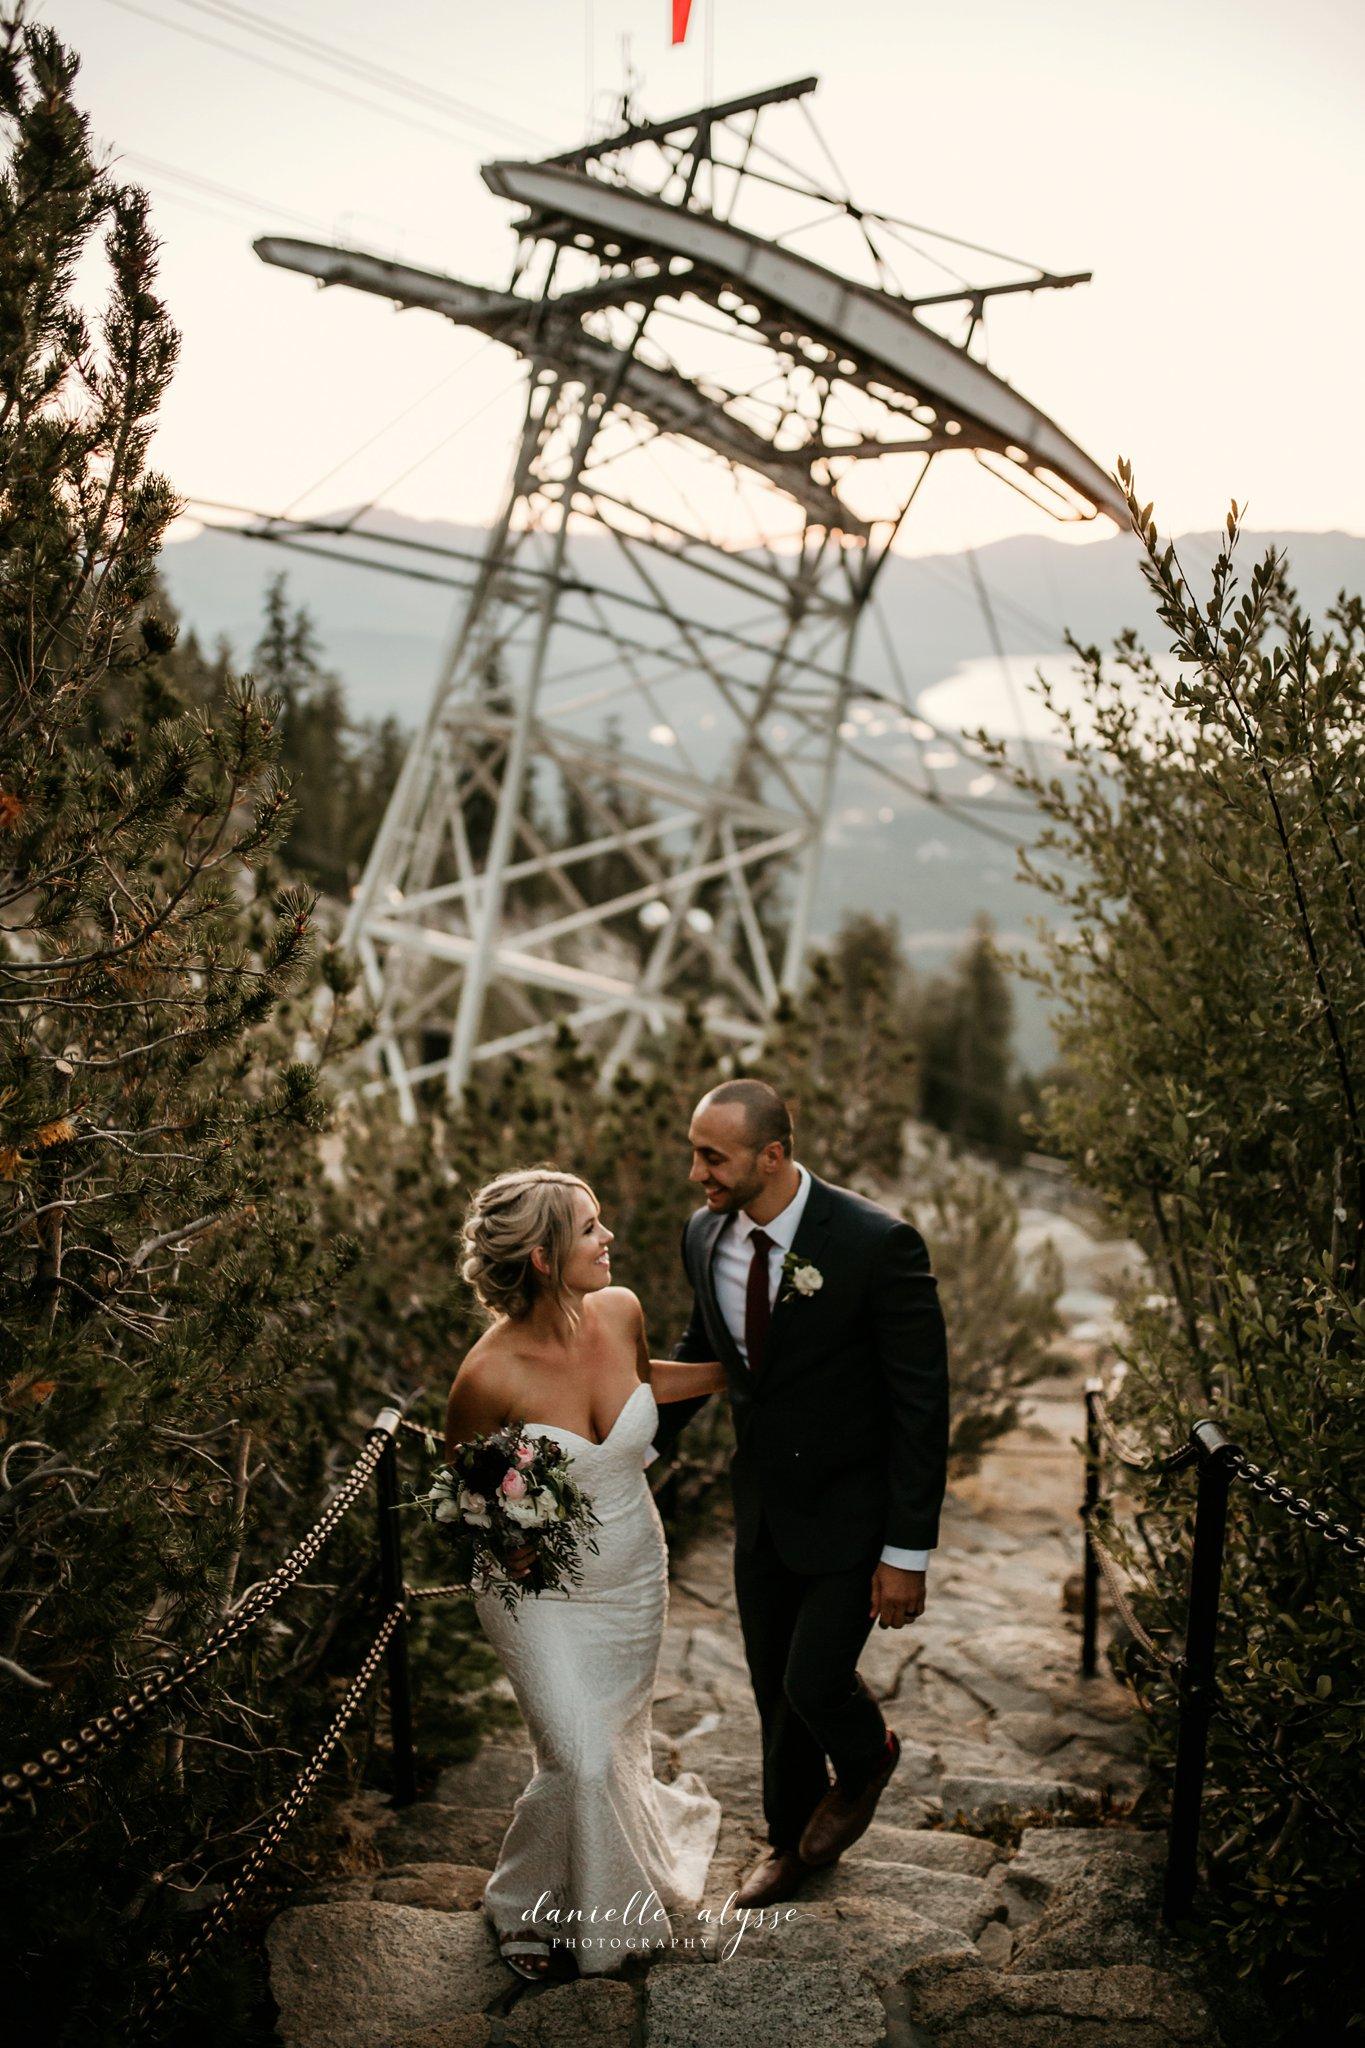 180831_wedding_stephanie_heavenly_south_lake_tahoe_danielle_alysse_photography_destination_blog_1046_WEB.jpg